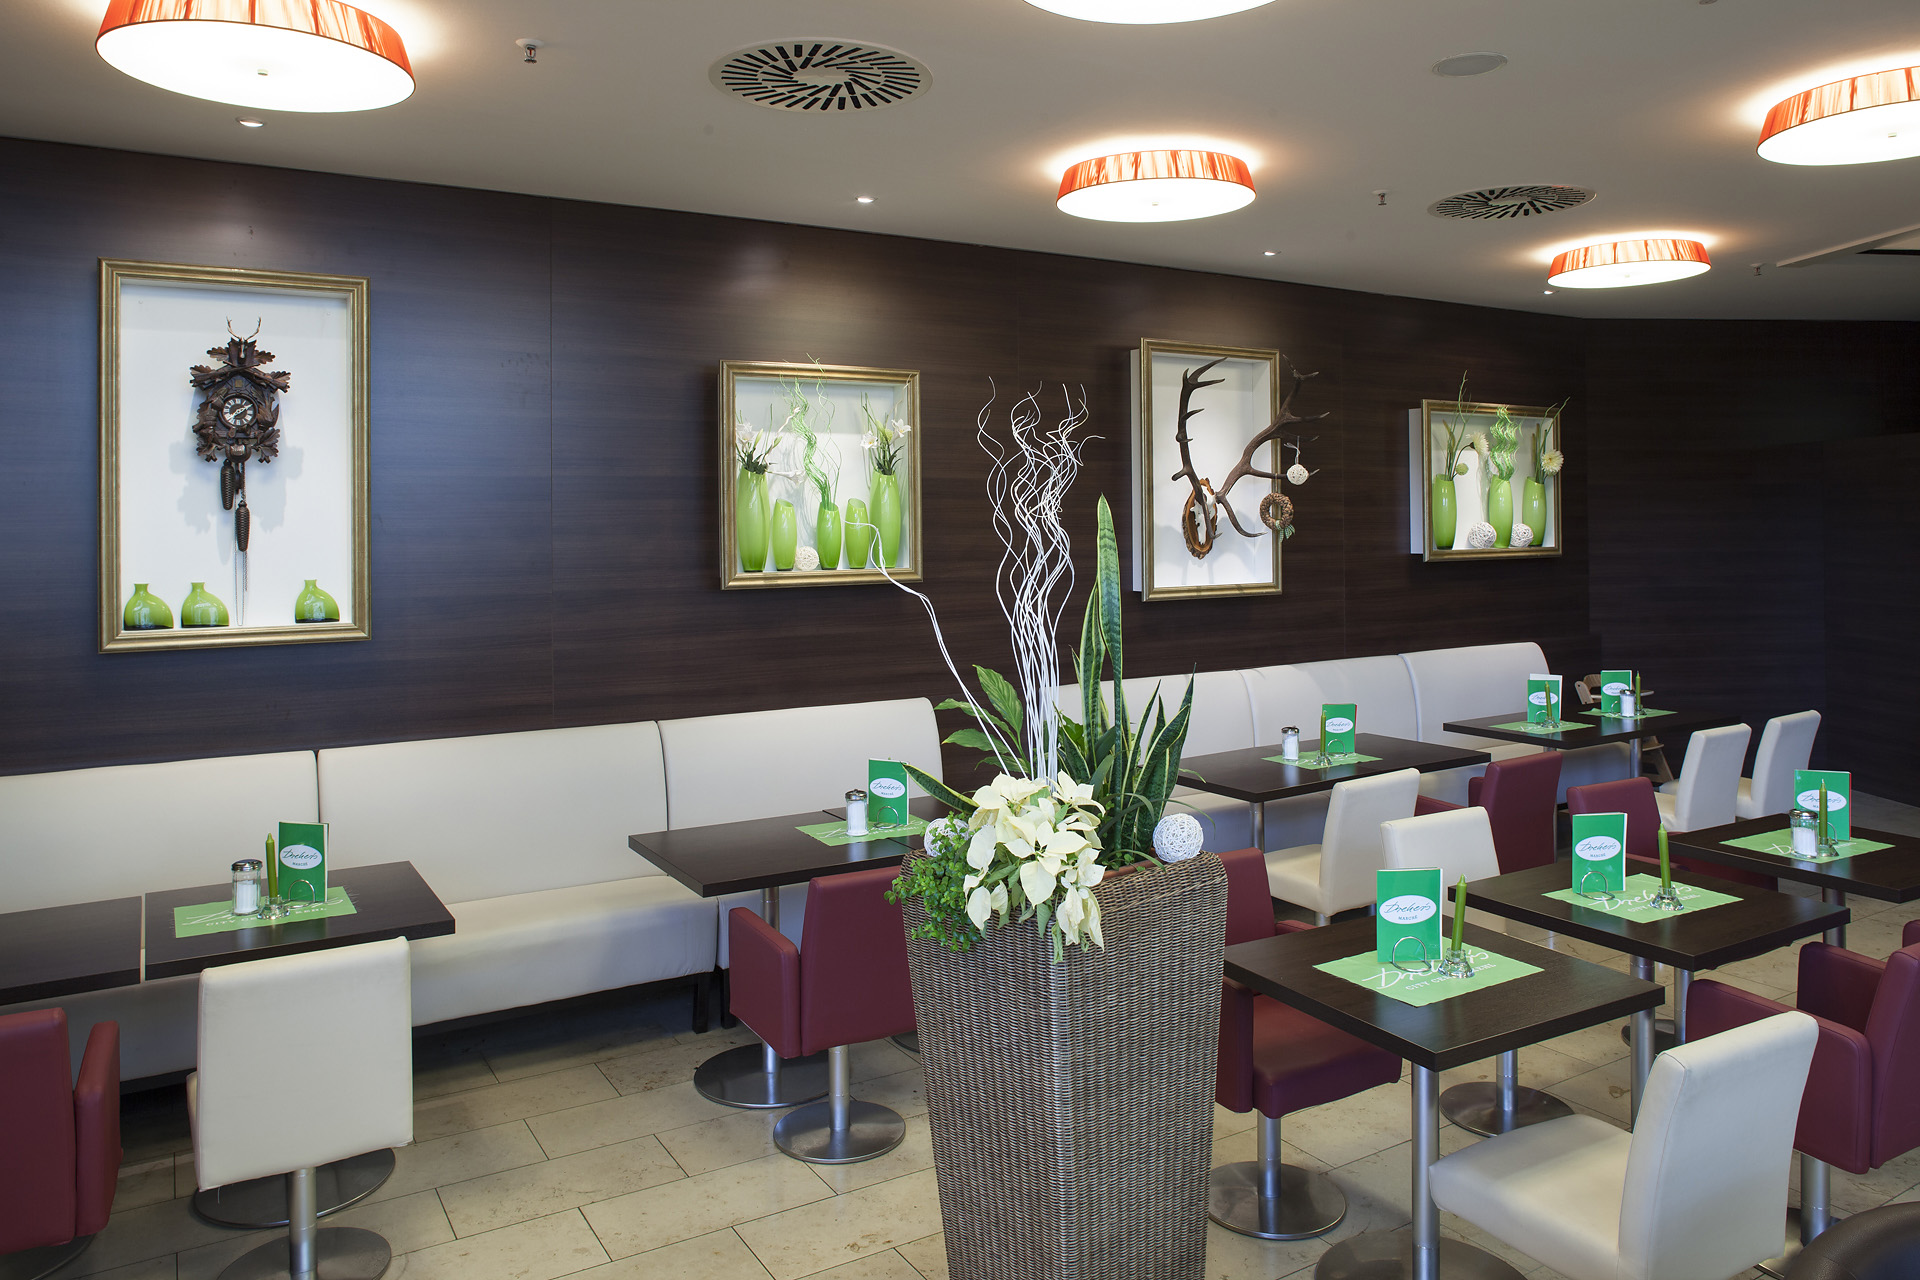 20.11.09, Cafè Dreher, City Center, 77694 Kehl, Aichinger